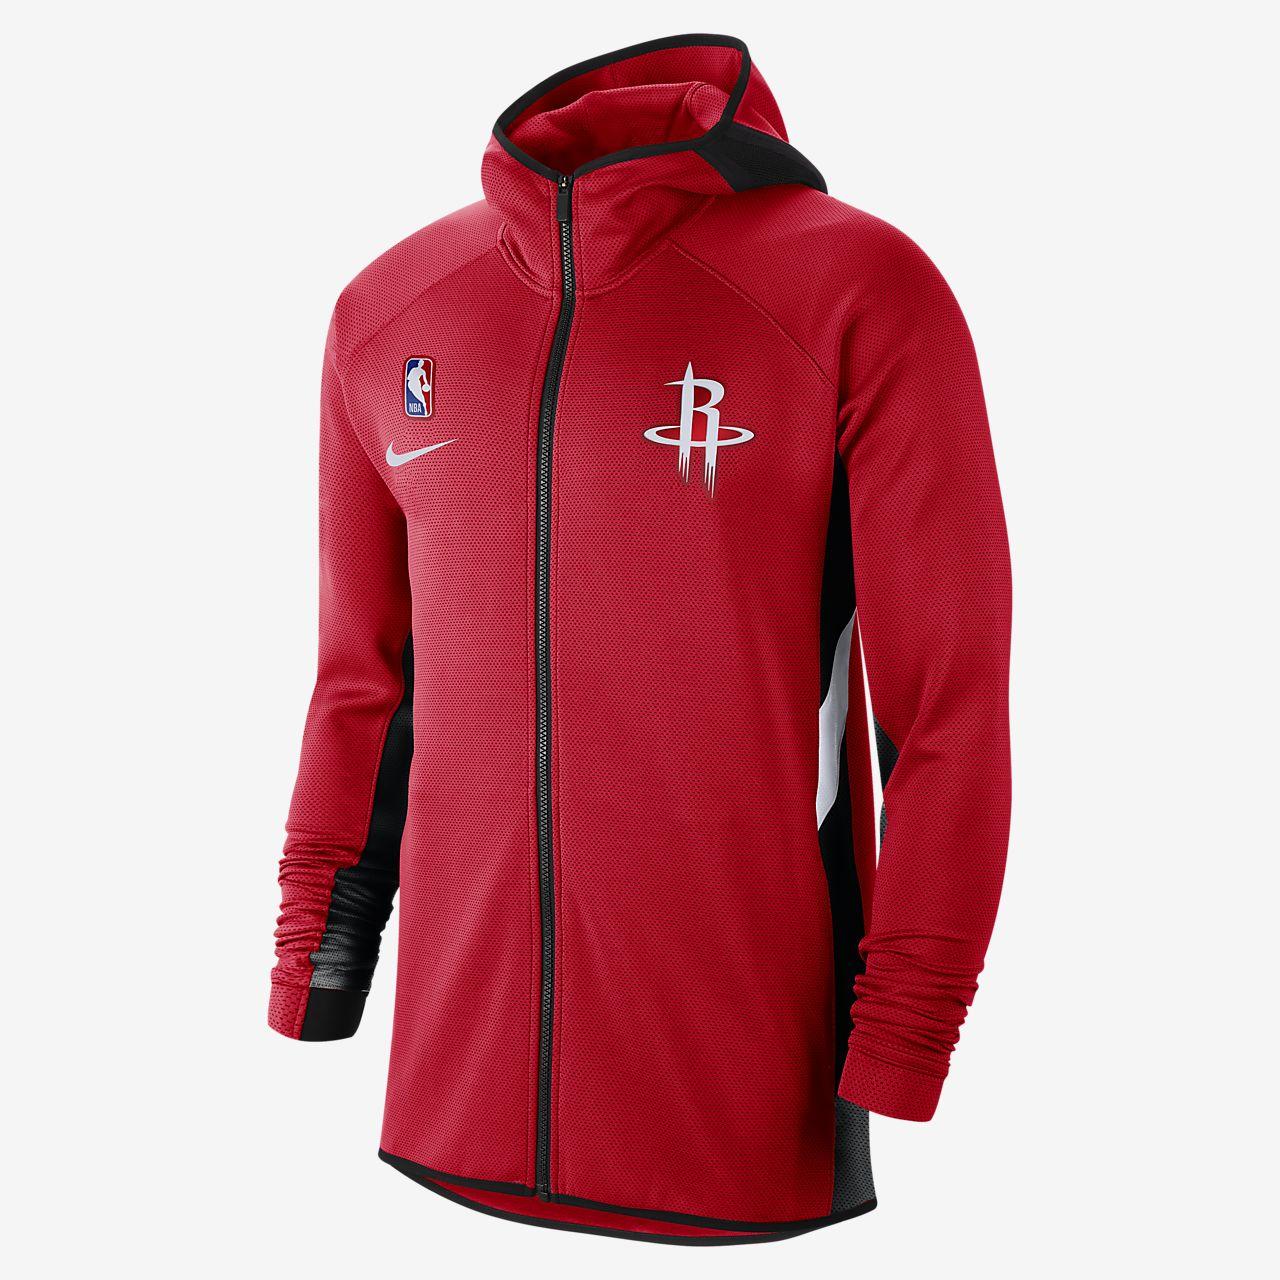 Mens Houston Rockets Jacket, Rockets Pullover, Houston